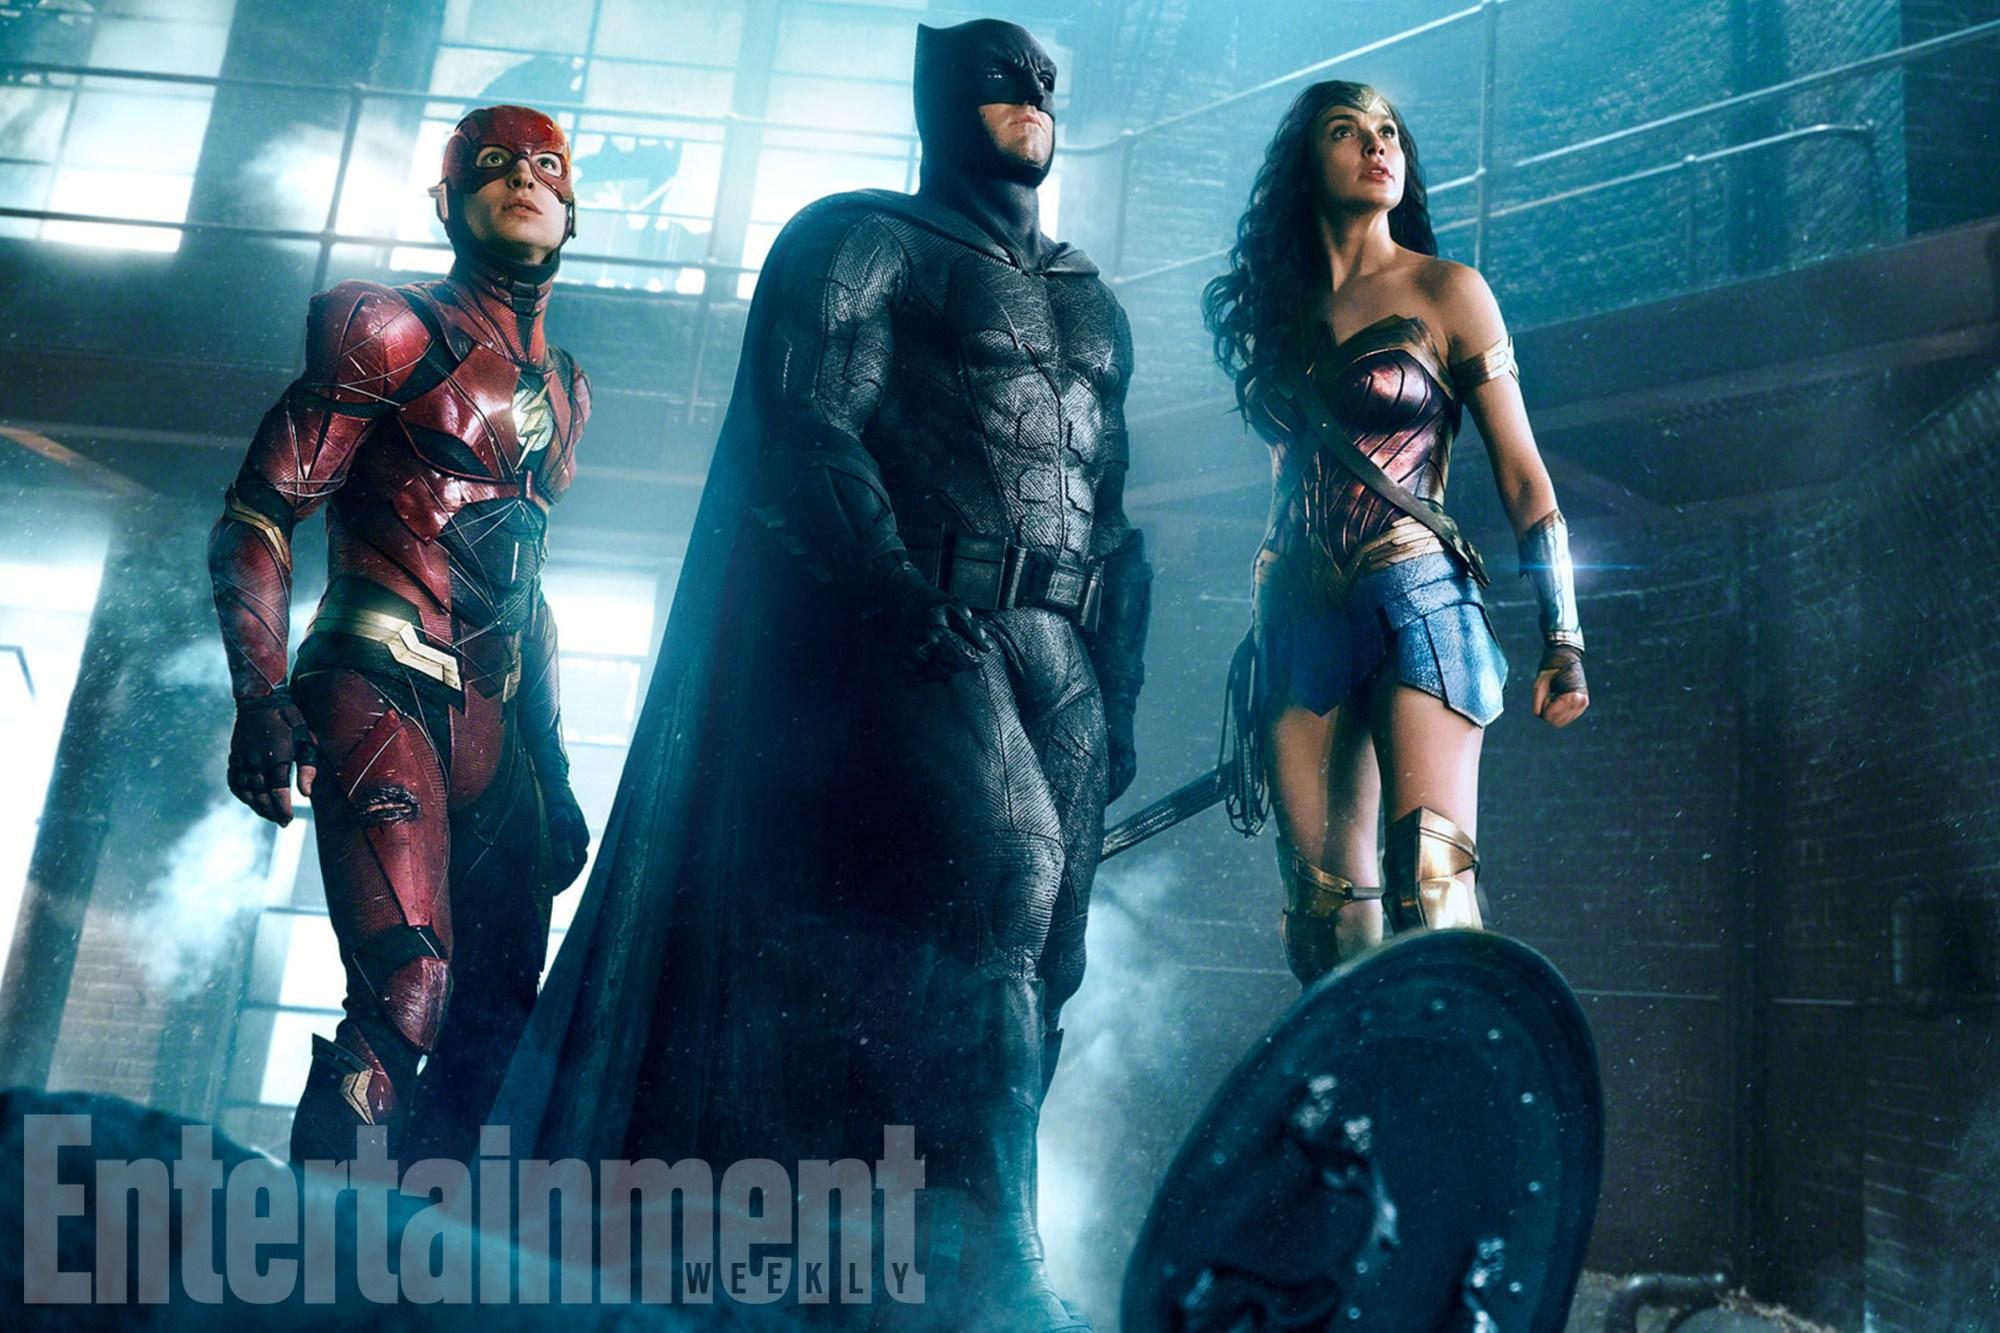 JUSTICE LEAGUE (2017)(L-r)†EZRA MILLER as The Flash,†BEN AFFLECK as Batman and GAL GADOT as Wonder WomanCredit: Warner Bros. Pictures/ ô & © DC Comics